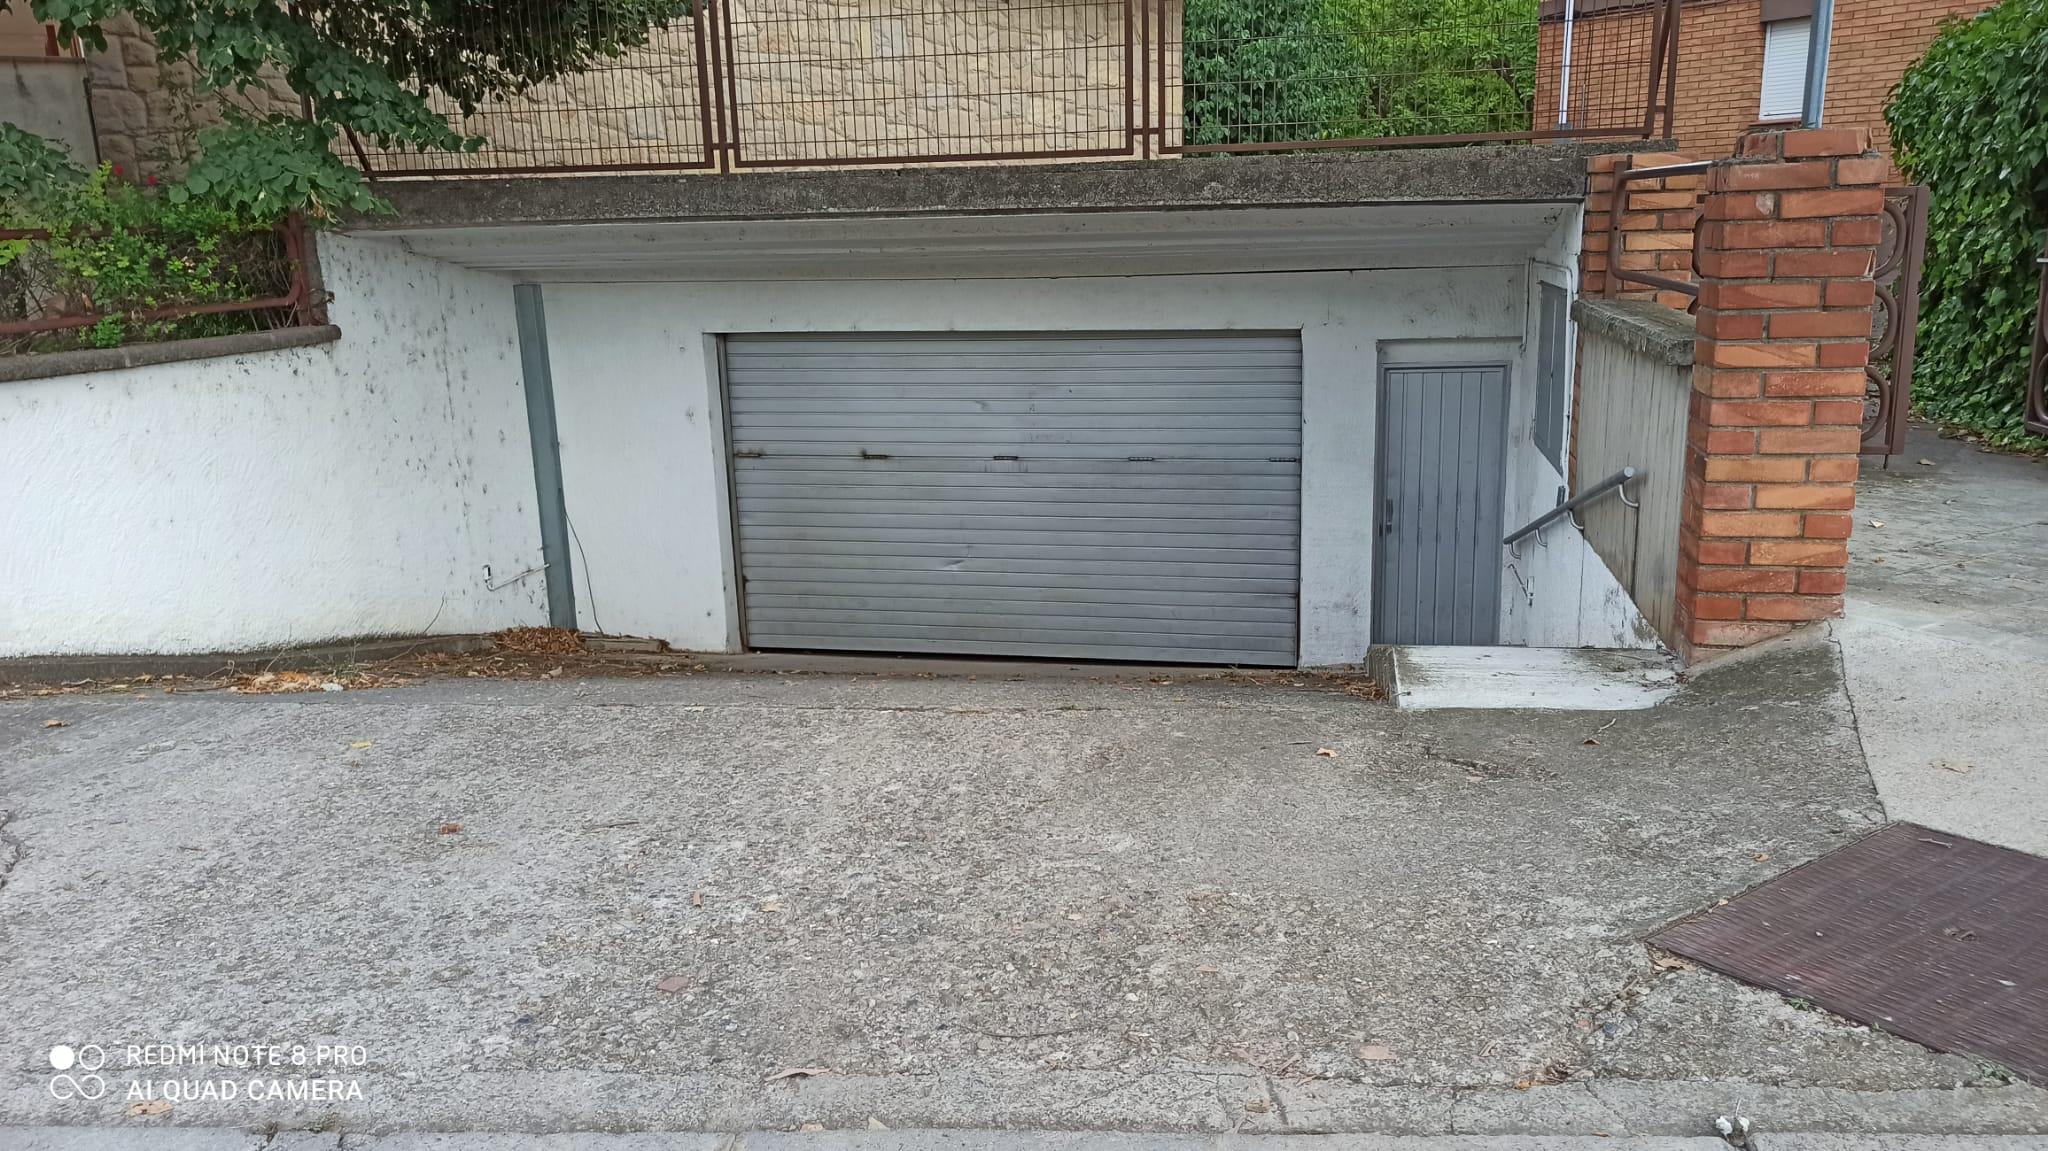 Aparcament cotxe  Carrer pedraforca. Plaza de parking en residencial delta